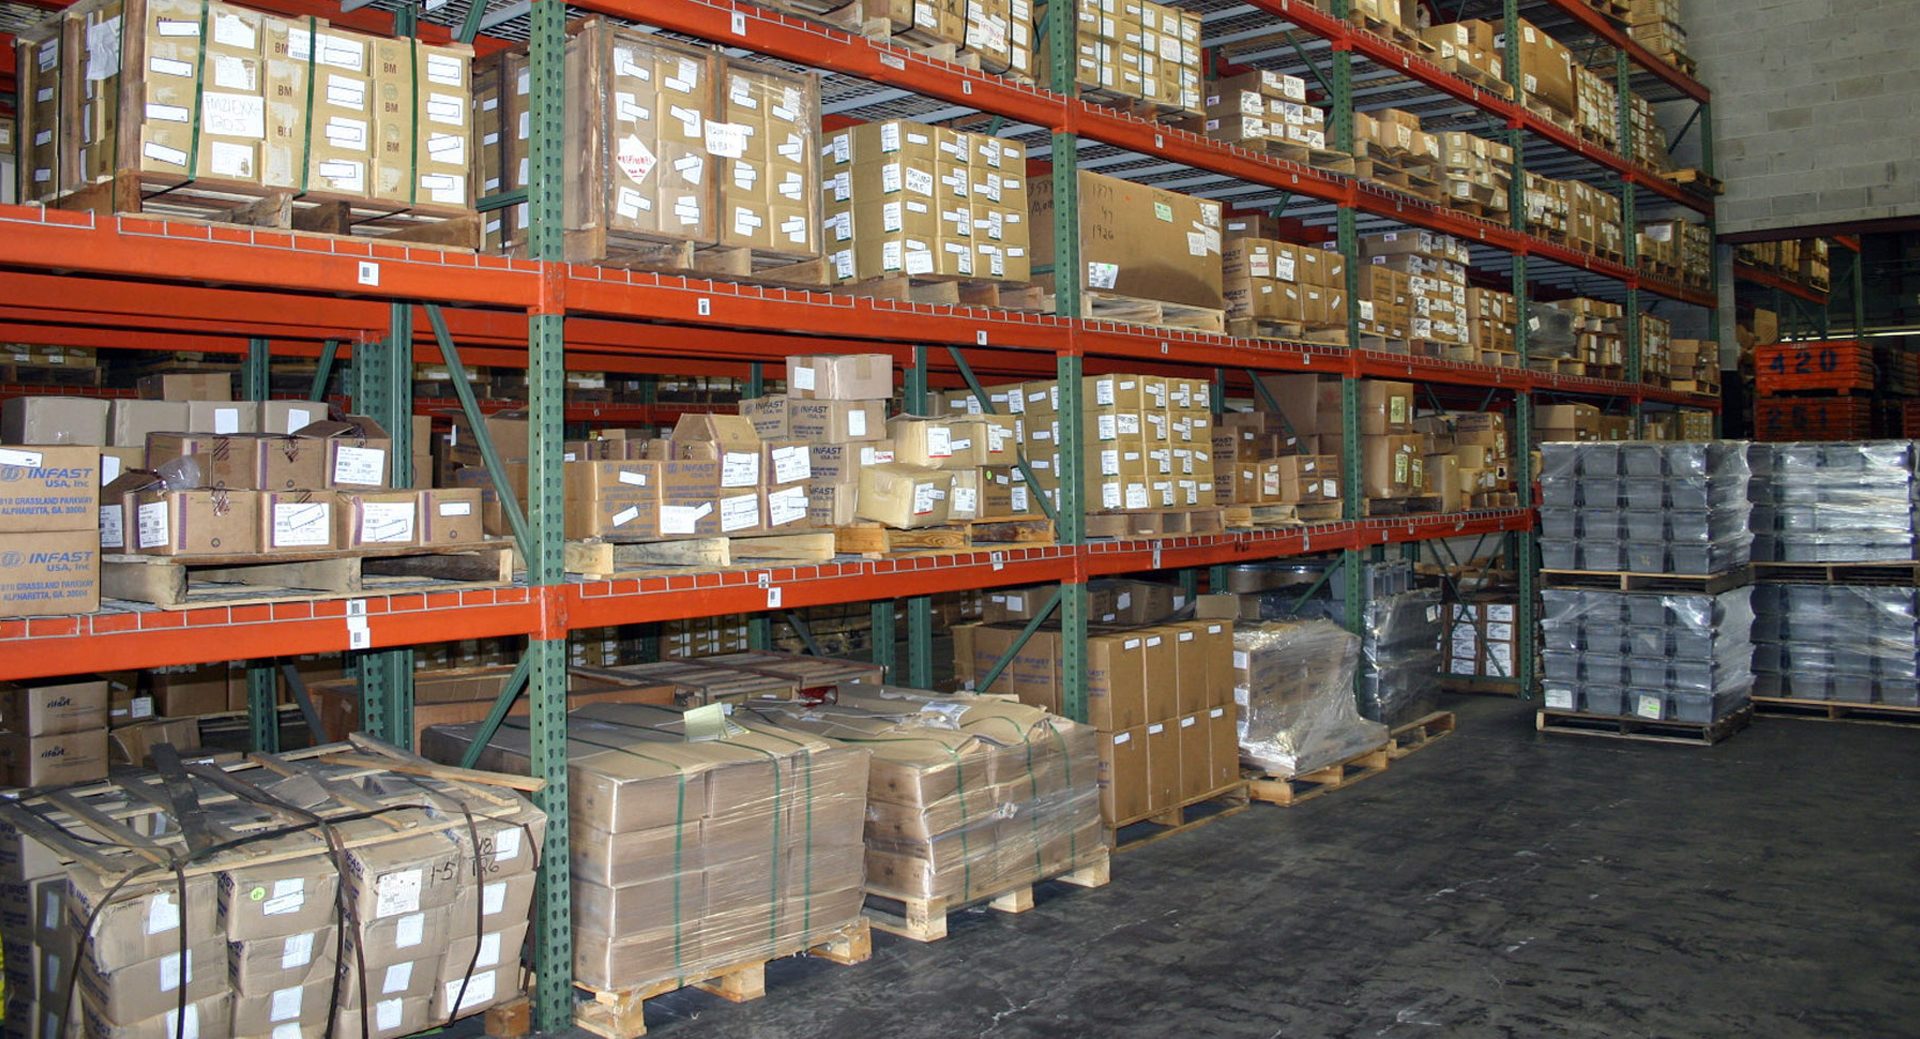 Storage (Warehousing)